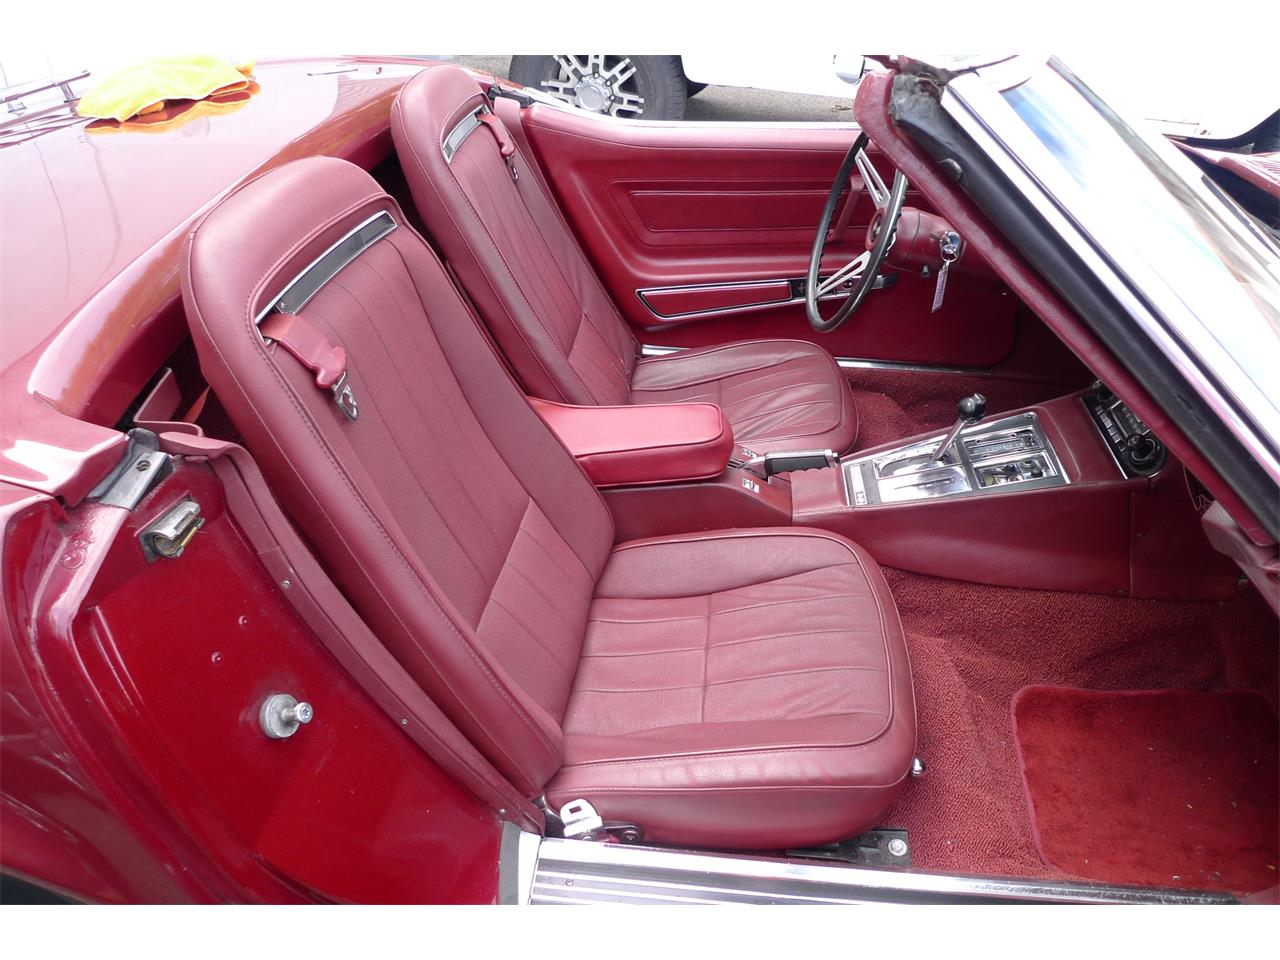 Large Picture of 1975 Corvette located in Anaheim California - $20,975.00 - L2GP